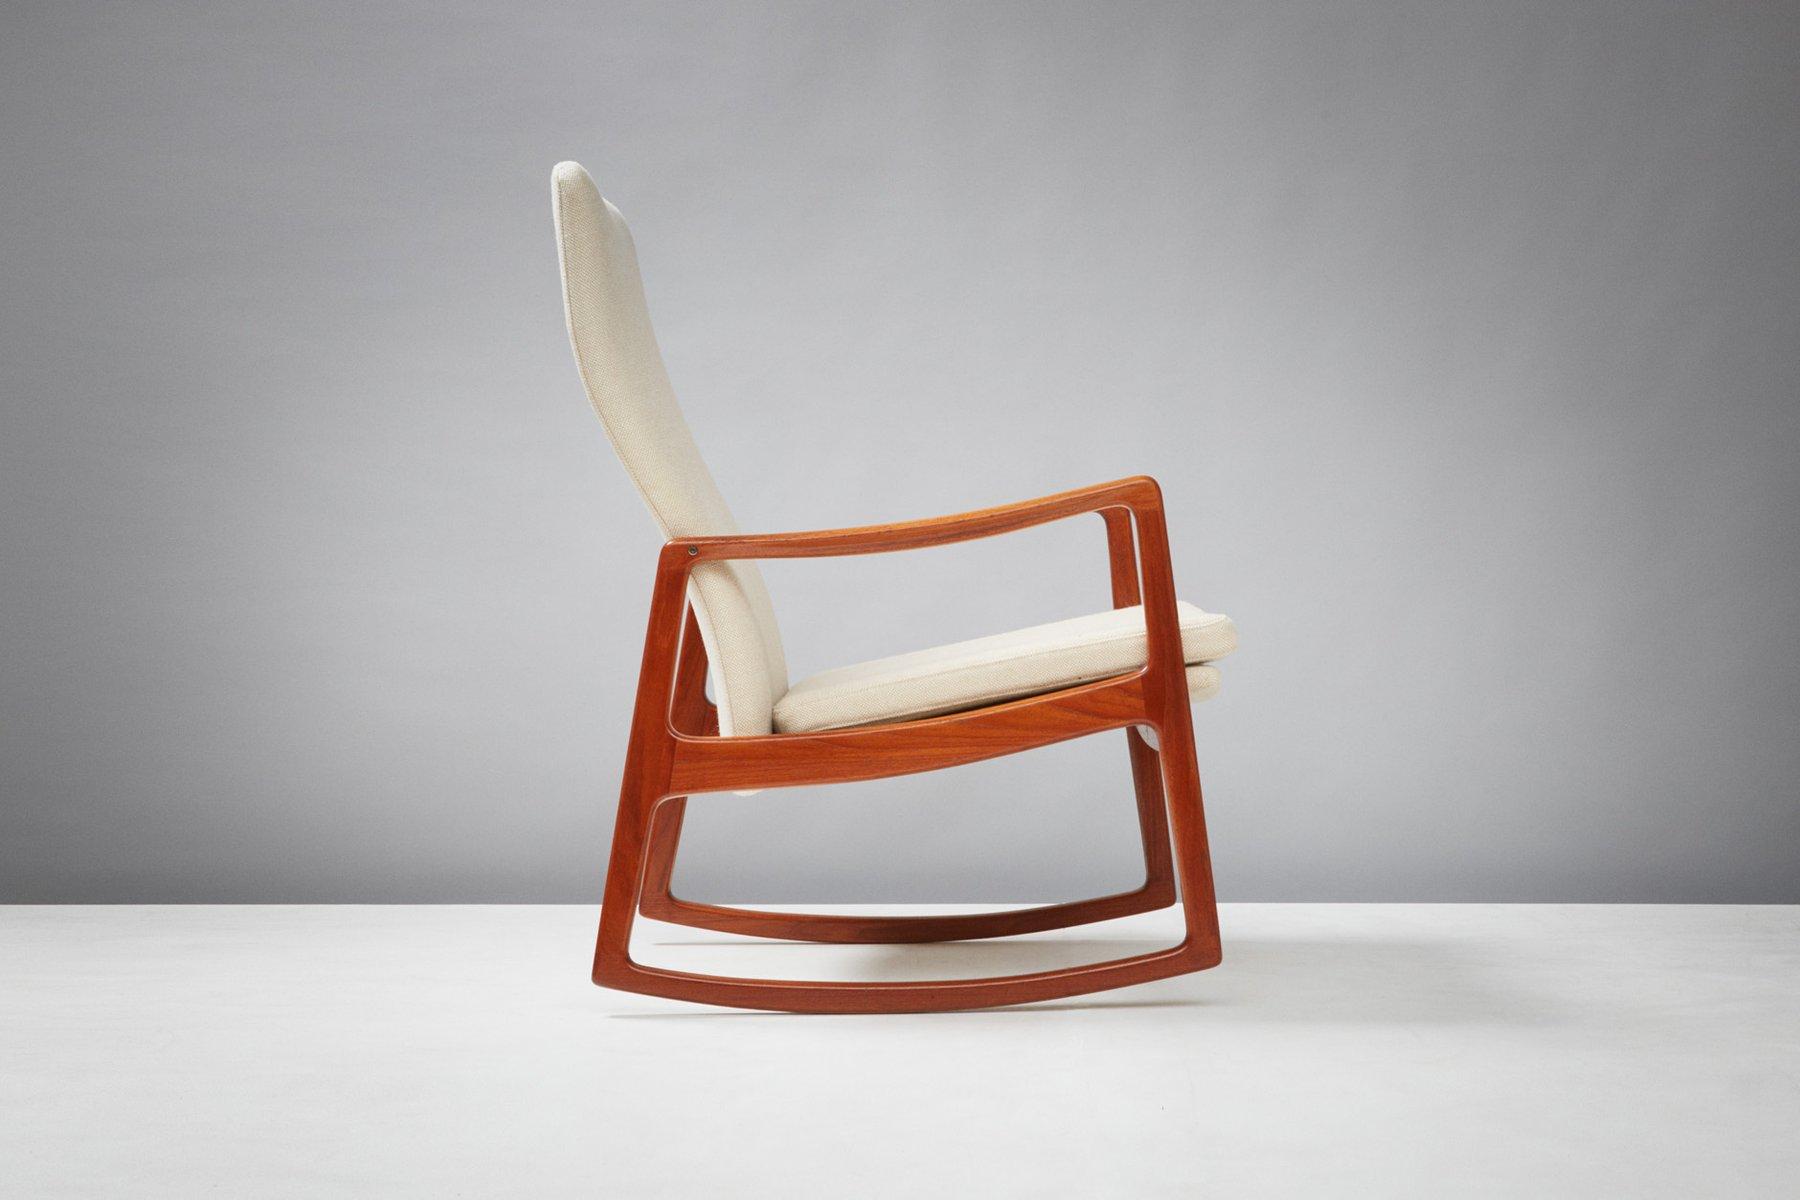 nz chair of baxton urban living studio modern century leather belham rocking small bamboo teak size mcrae mid outfitters full danish